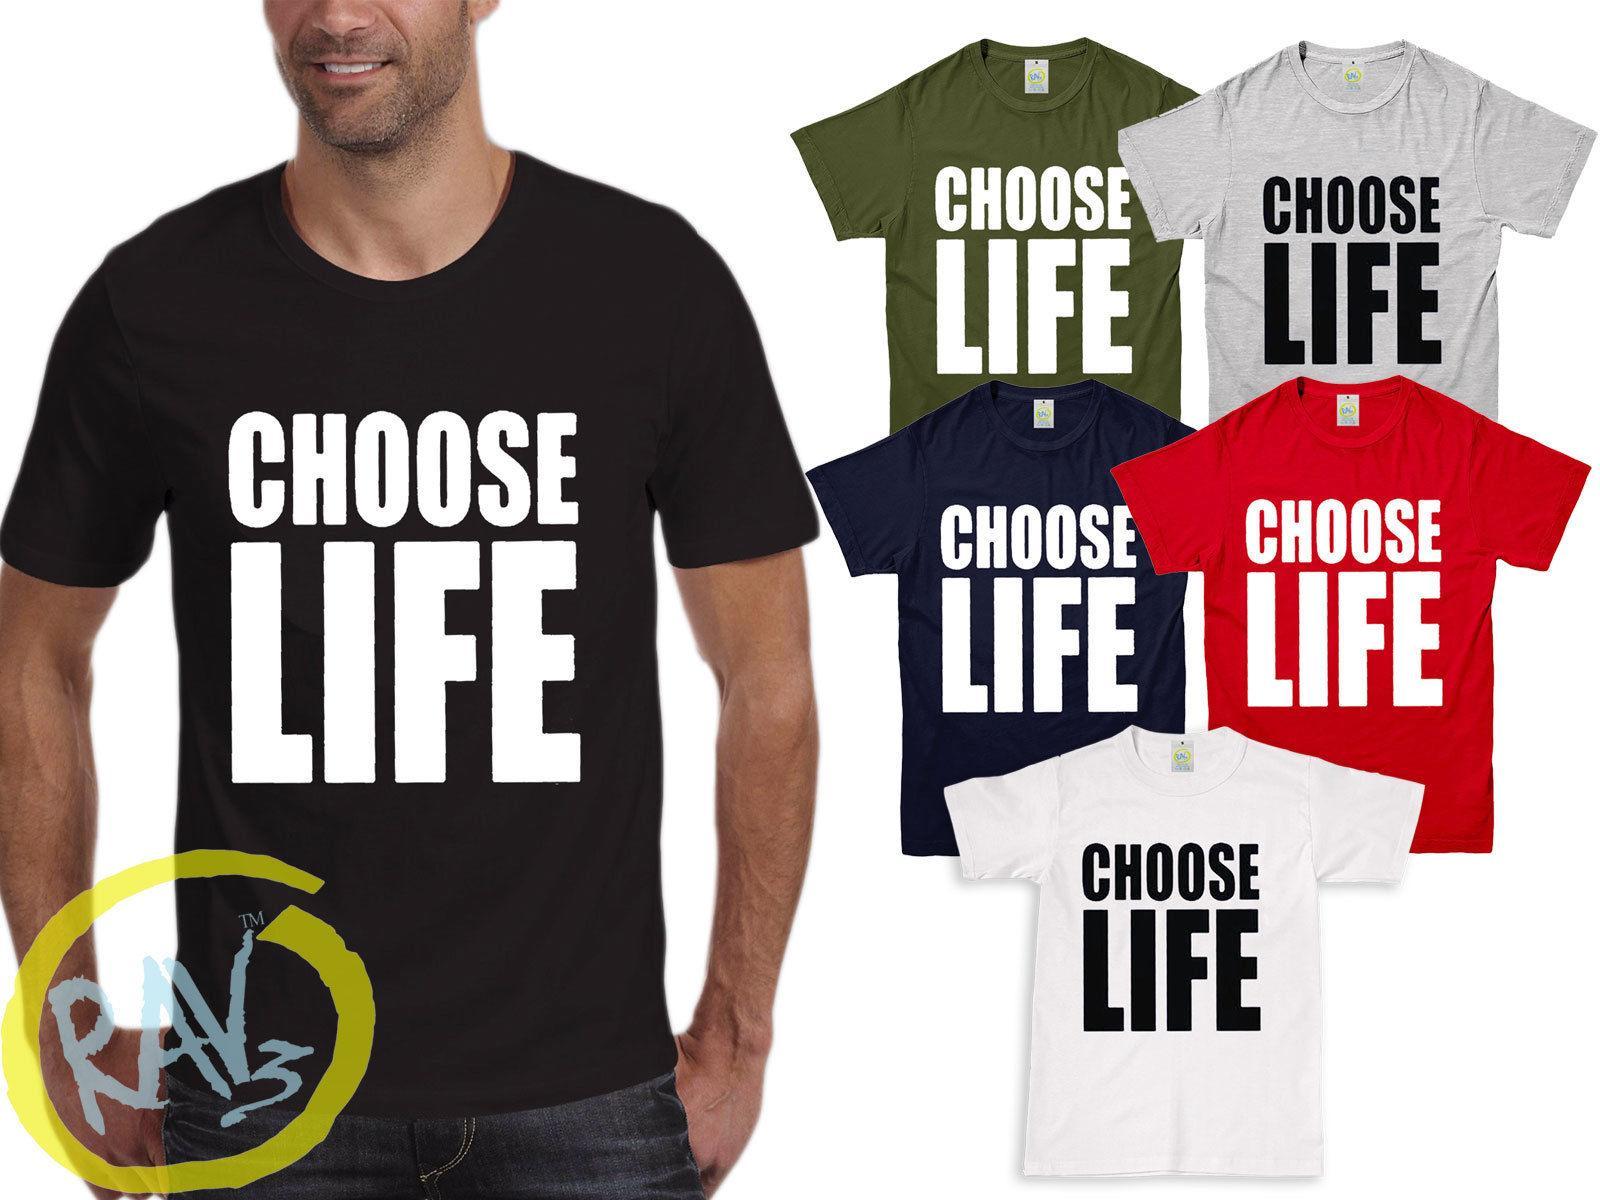 Choose Life T Shirt Wham 80s George Michael Fancy Dress Concert Top New Funny Casual Tshirt Top Designer T Shirts Short Sleeve Shirts From Roboteatstofu 12 96 Dhgate Com